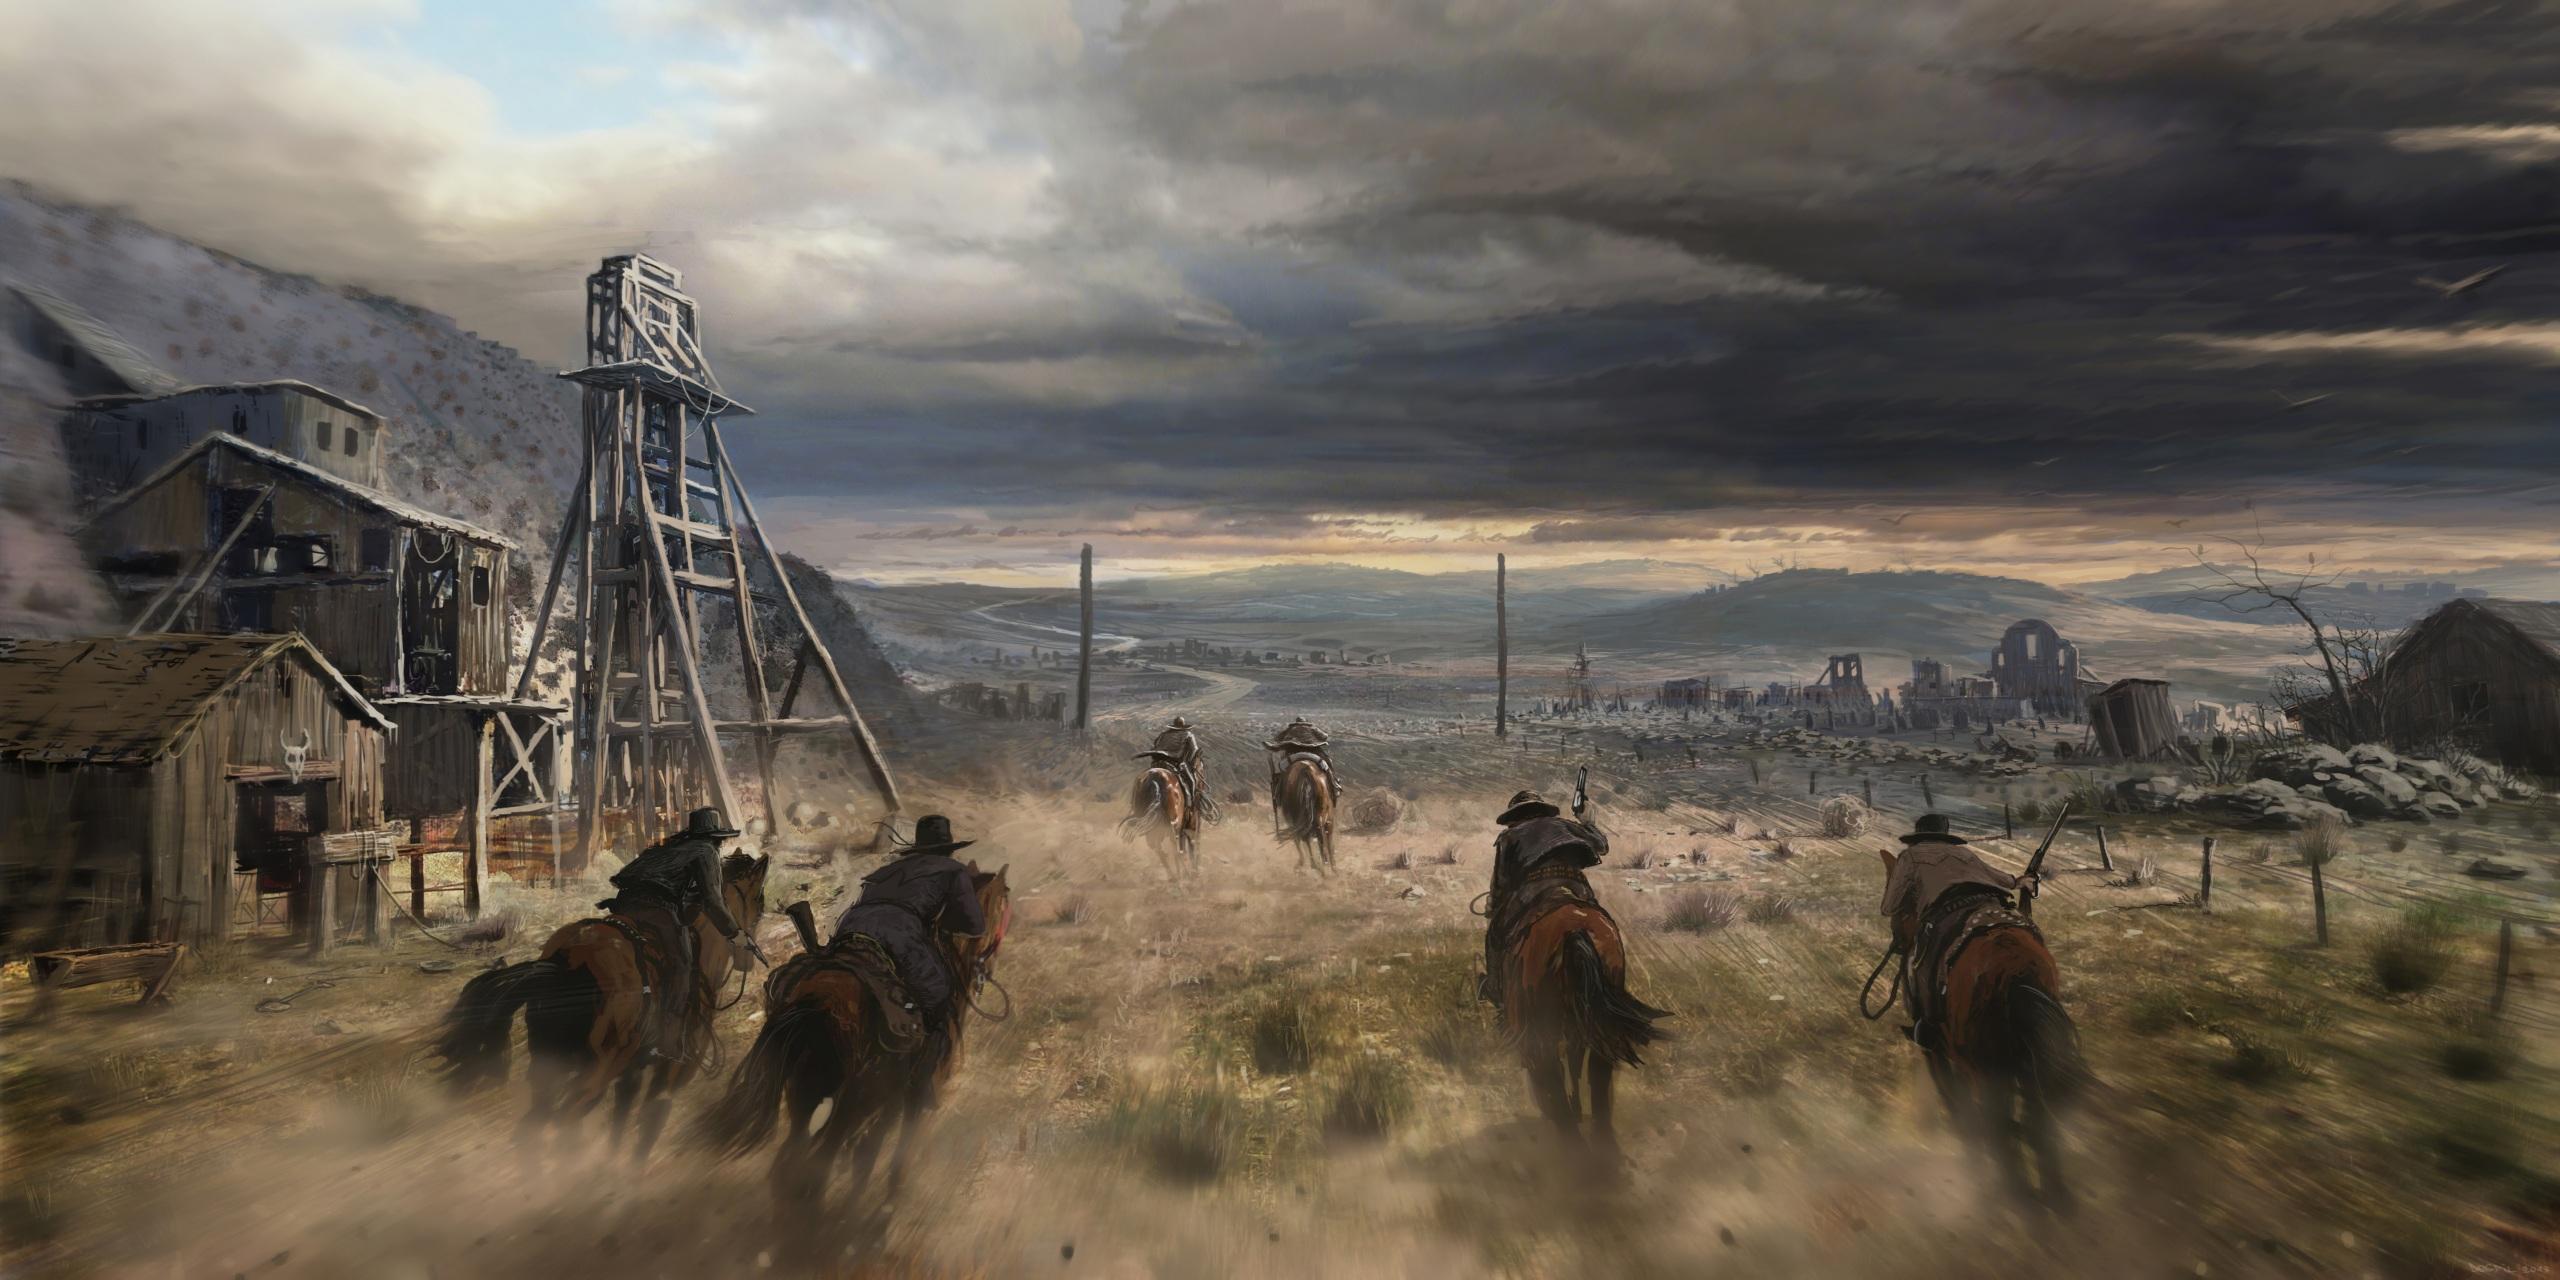 3d Motion Wallpaper For Mobile Hot Cowboy Backgrounds Pixelstalk Net